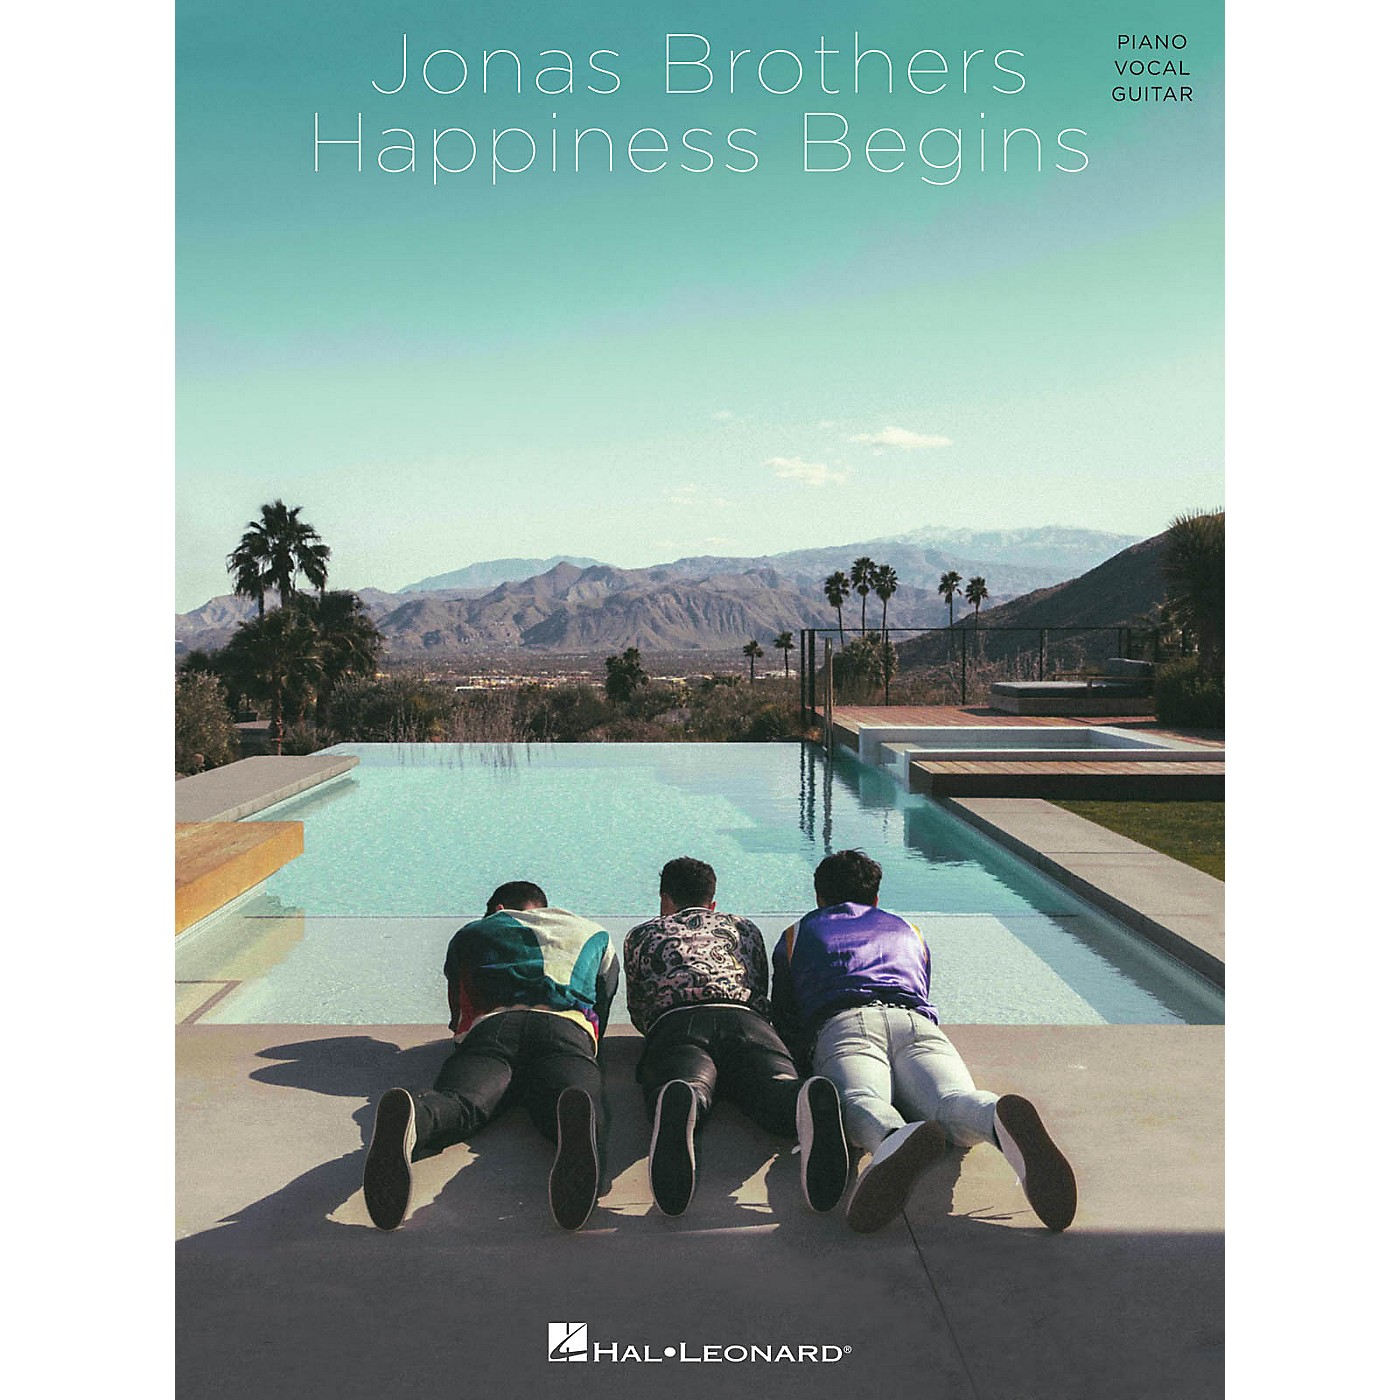 Hal Leonard Jonas Brothers - Happiness Begins Piano/Vocal/Guitar Songbook thumbnail